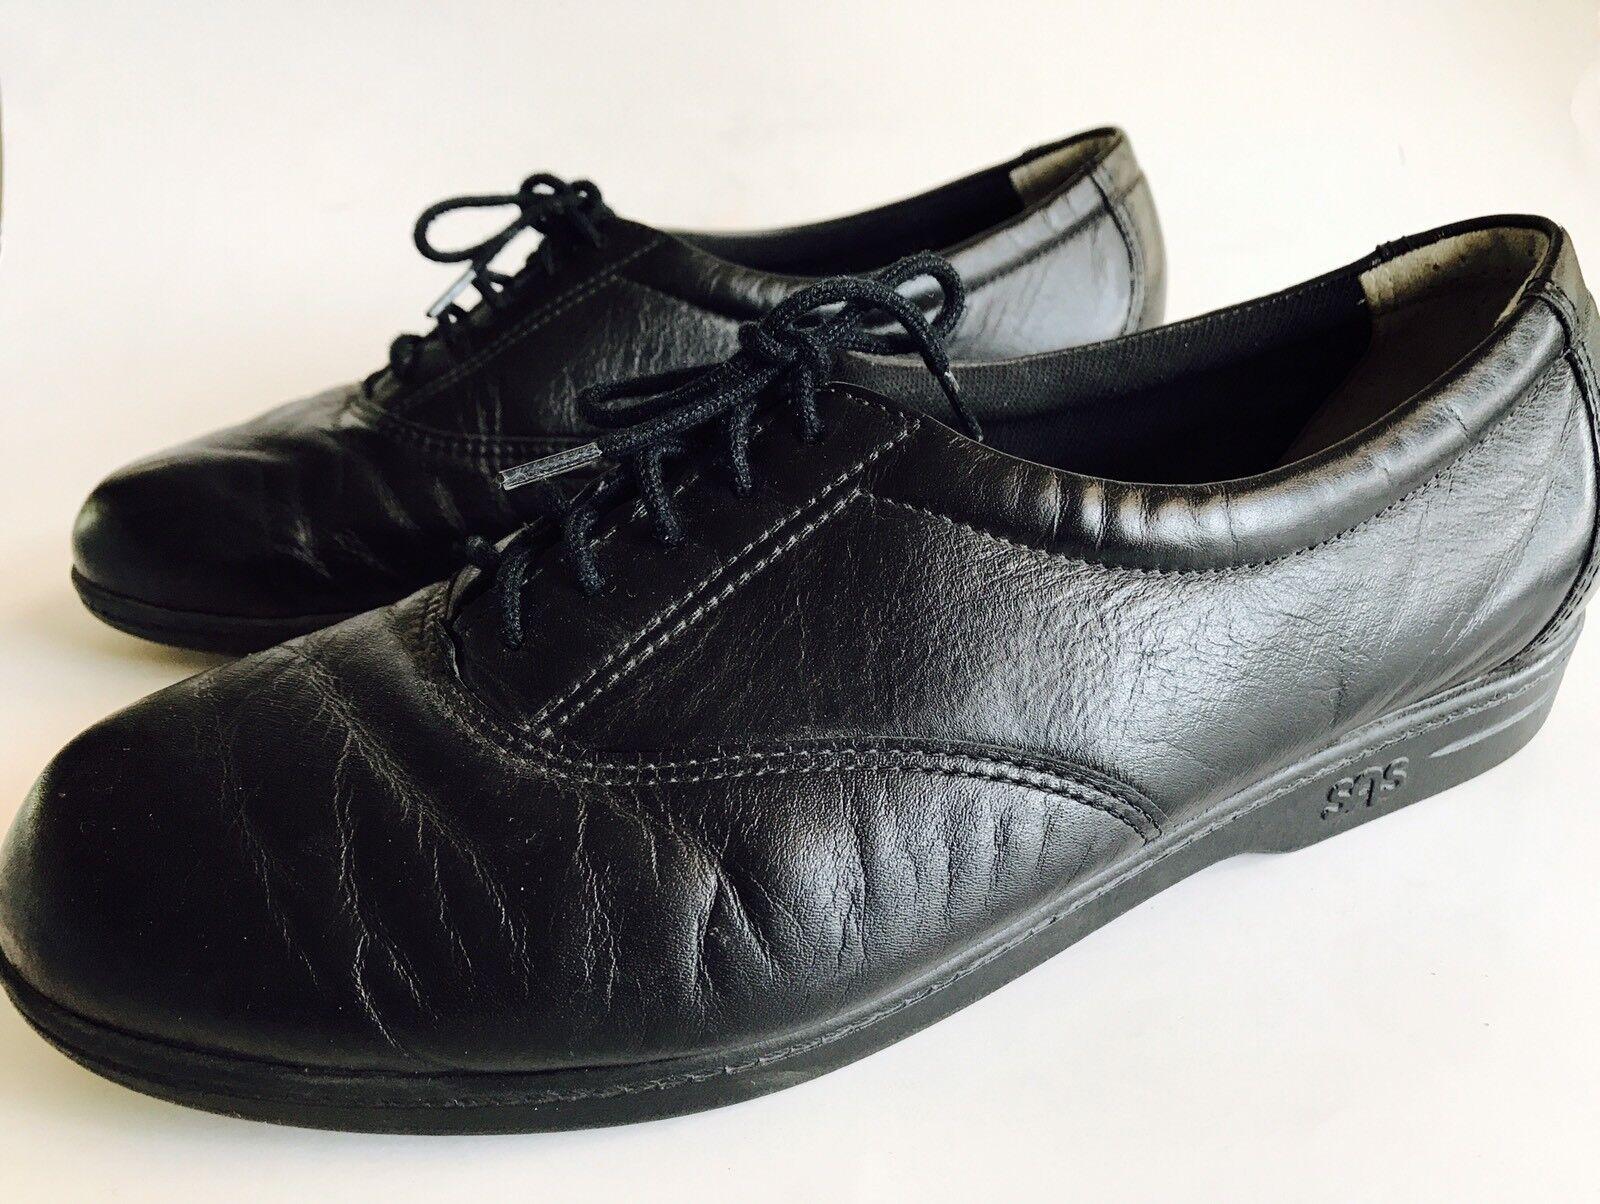 SAS Tripad Black Leather Oxfords Walking Comfort shoes Women's 9.5M USA made